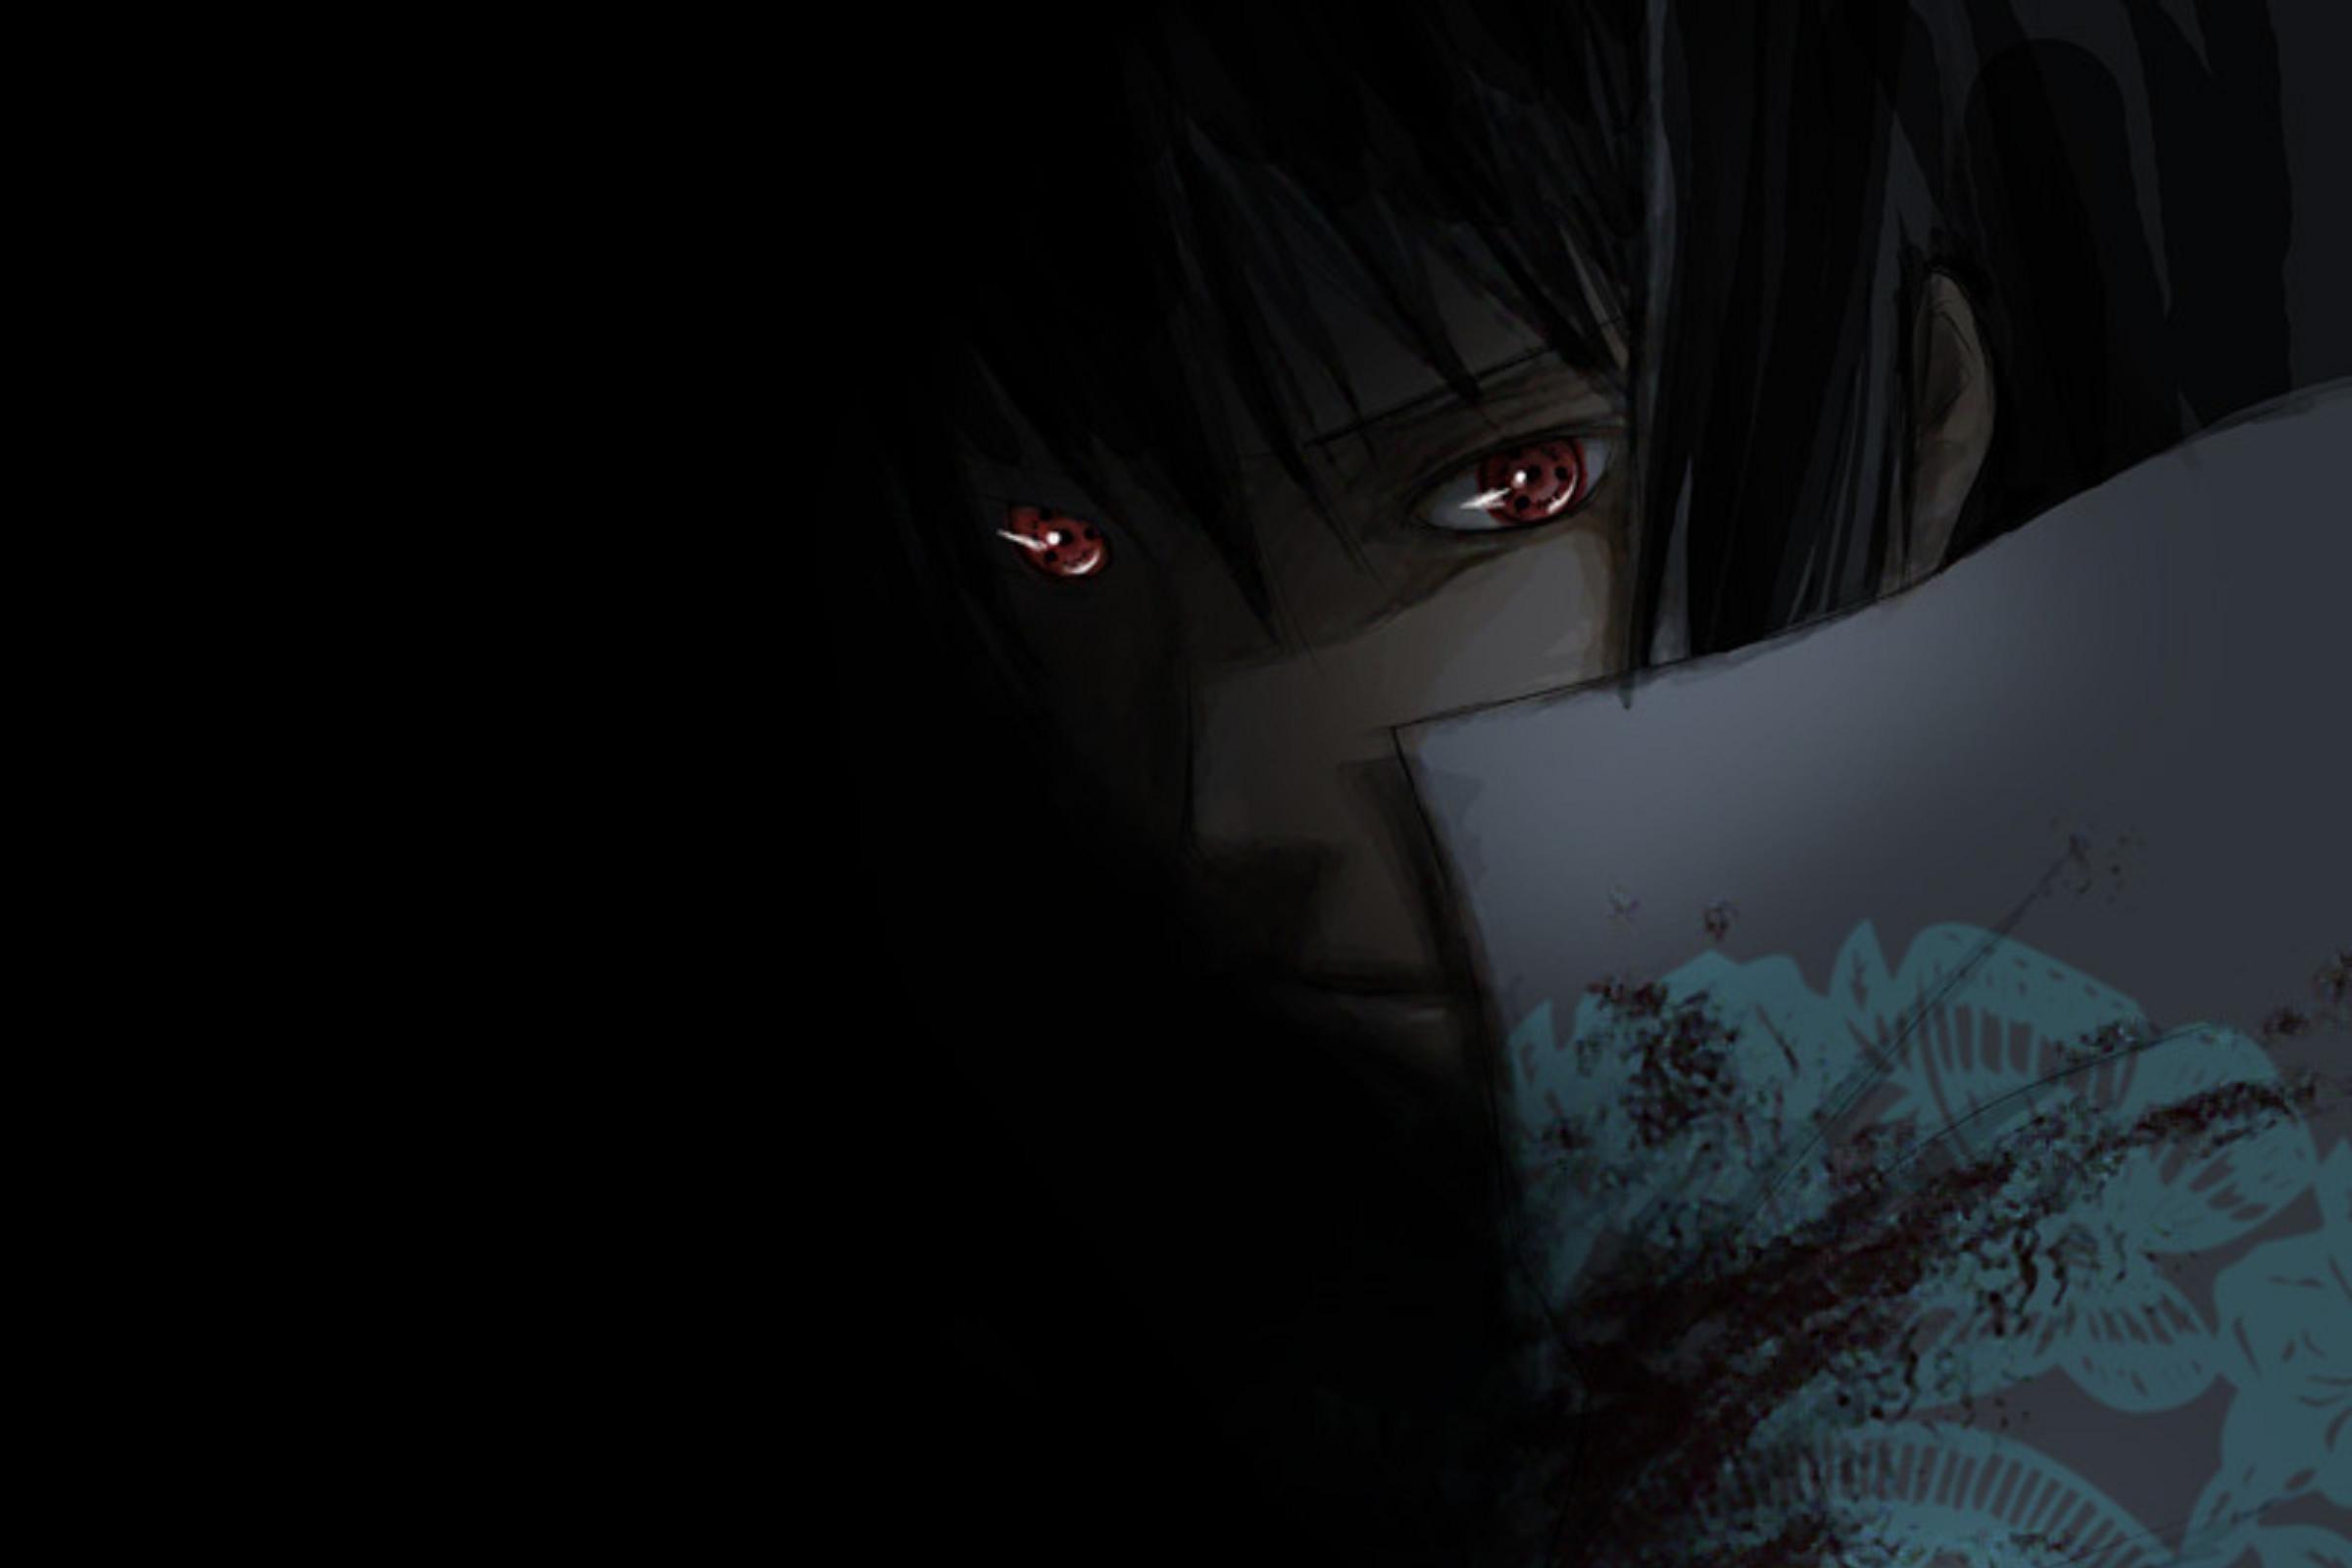 Alone Hd Wallpapers 1080p Sasuke Uchiha Wallpaper 183 ① Download Free Awesome Full Hd